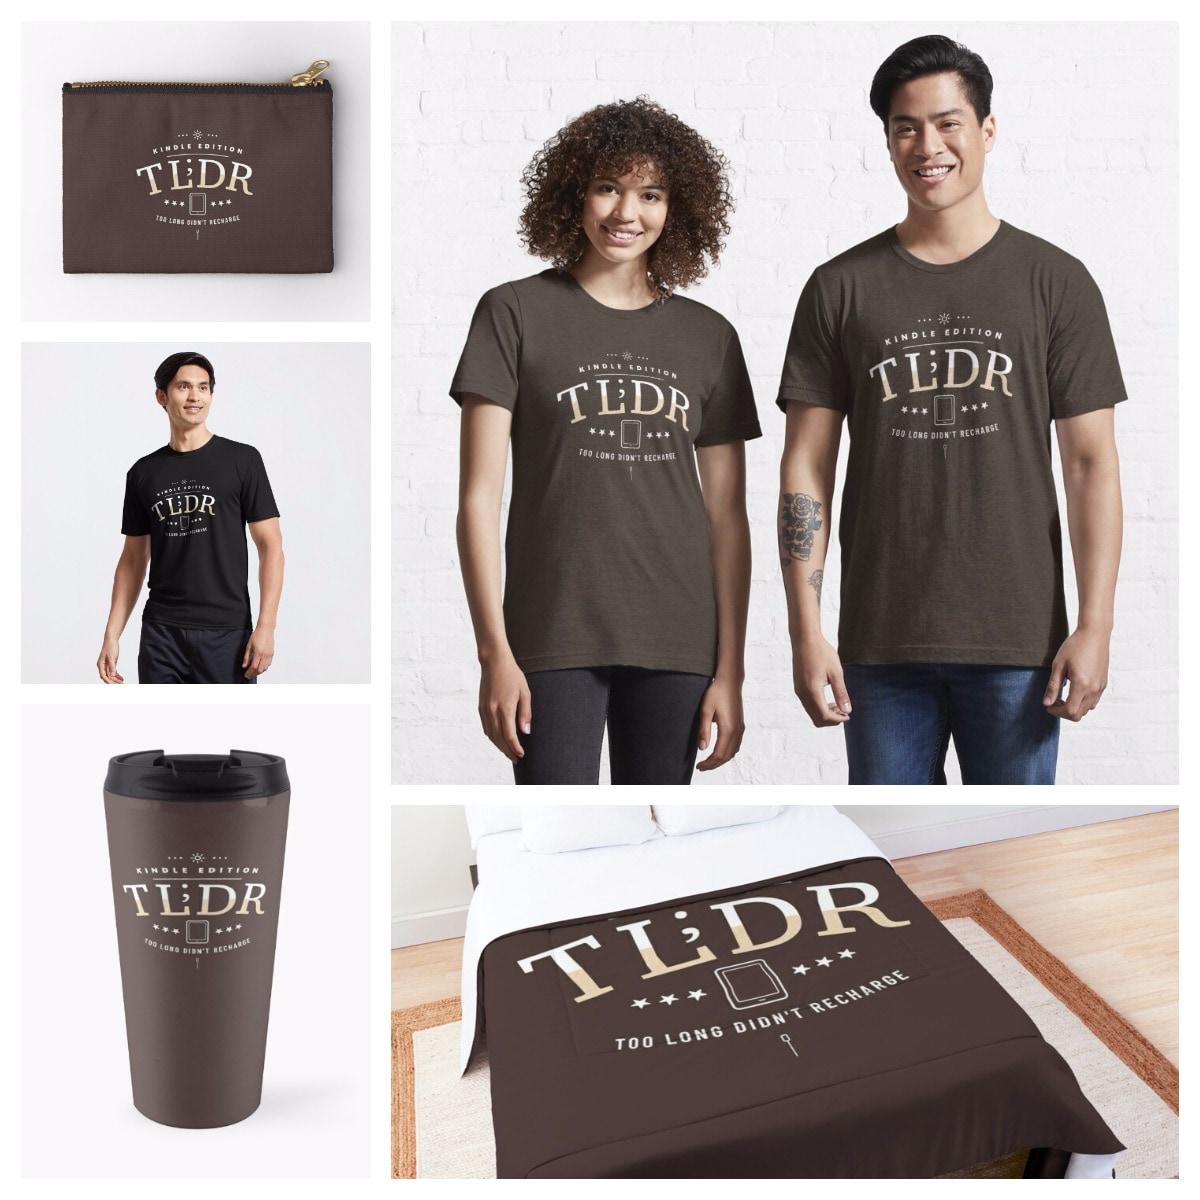 TL;DR Kindle edition - t-shirts, mugs, pouch, duvet